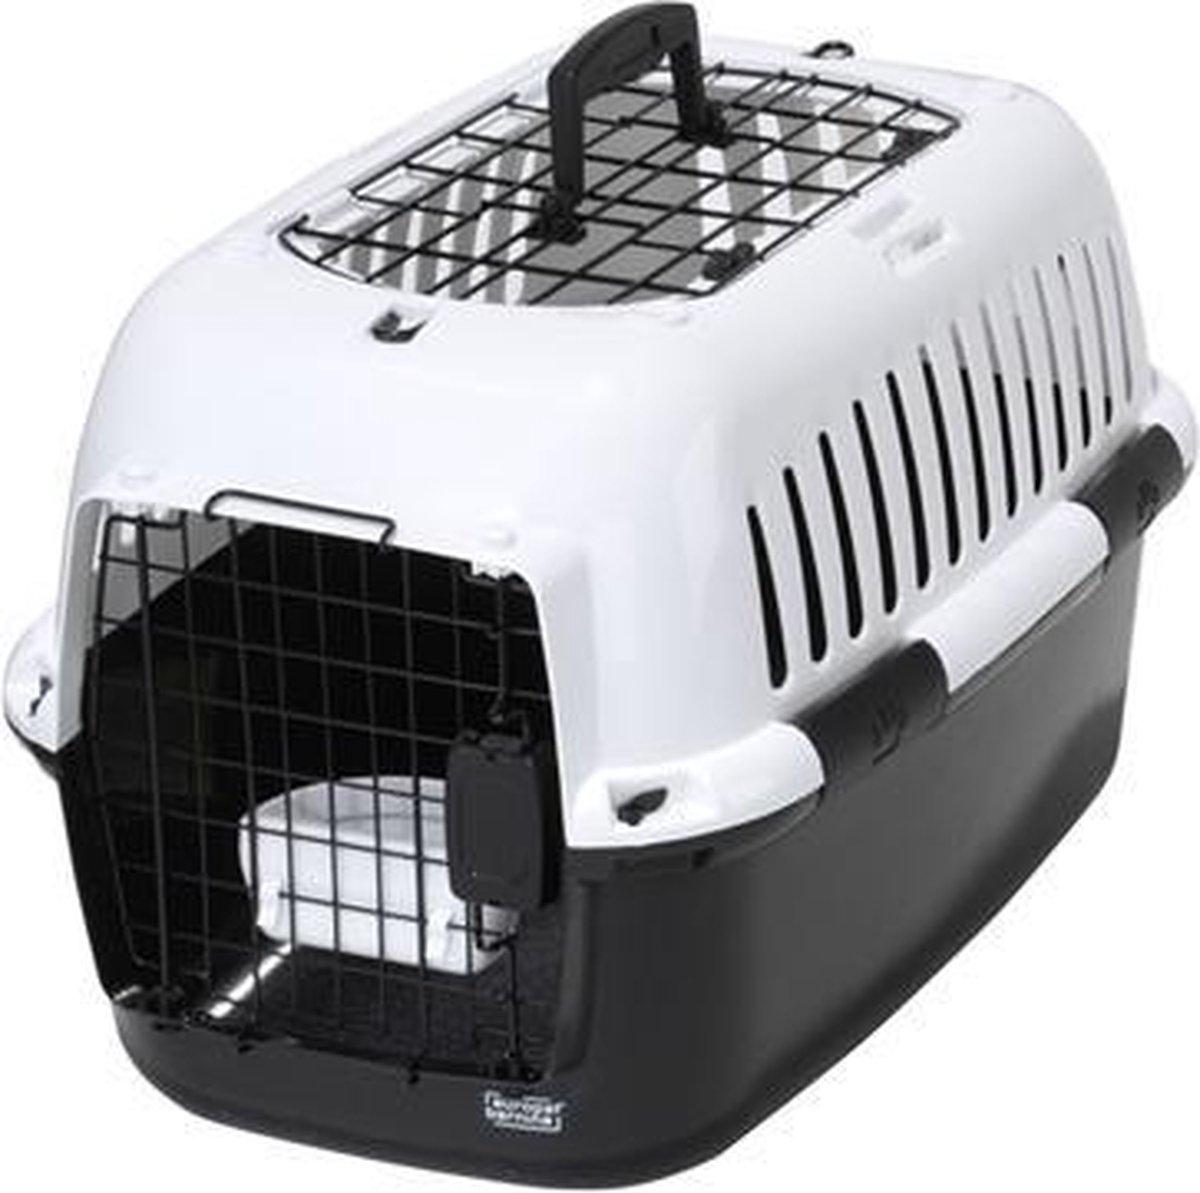 Ebi Adventurer 60 charcoal reismand - kleine hond of kat - Zwart/Wit - 57 x 38 x 38cm